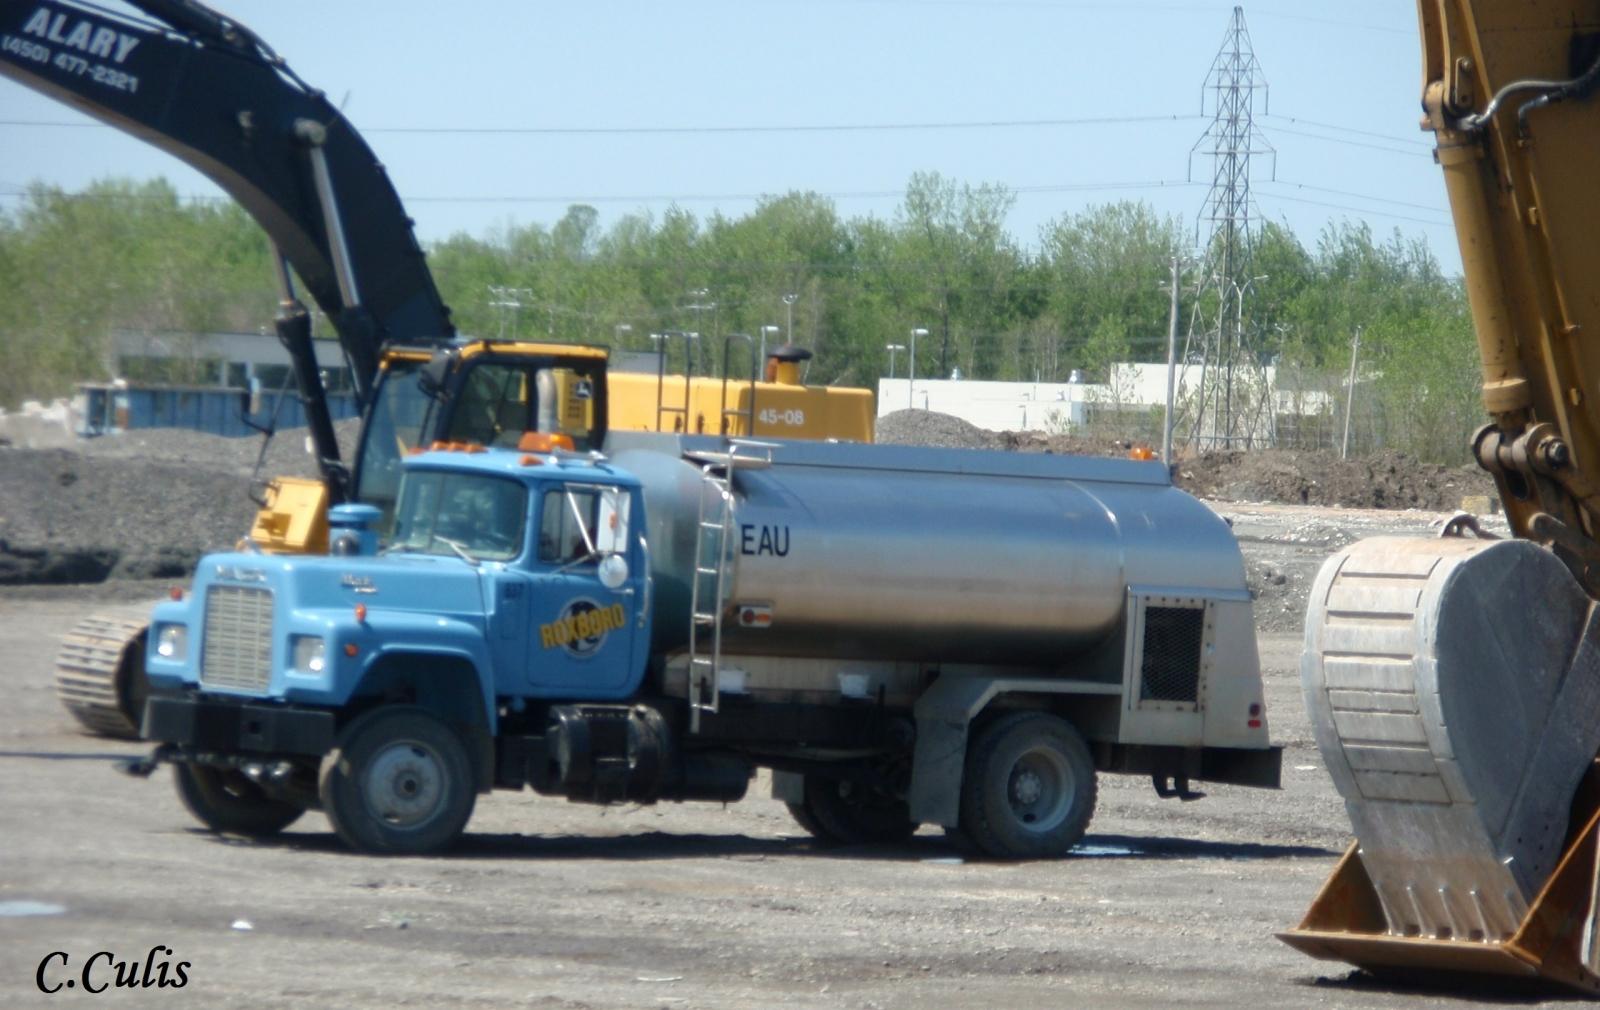 Mack R Roxboro water truck/arroseuse